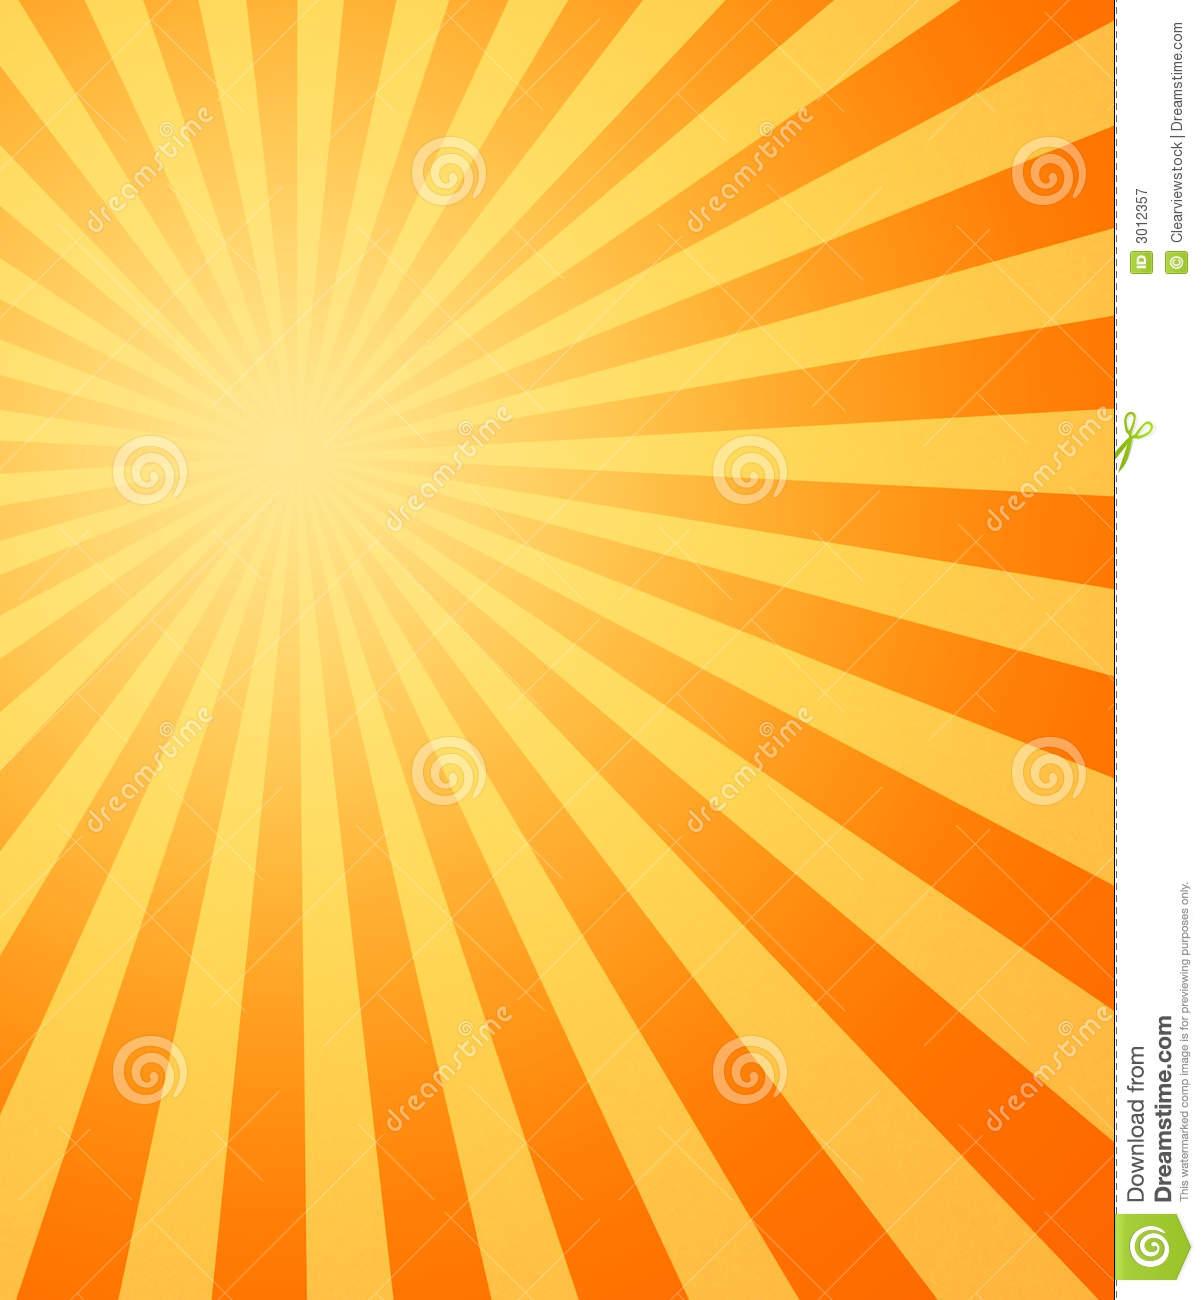 Sun beams clipart.